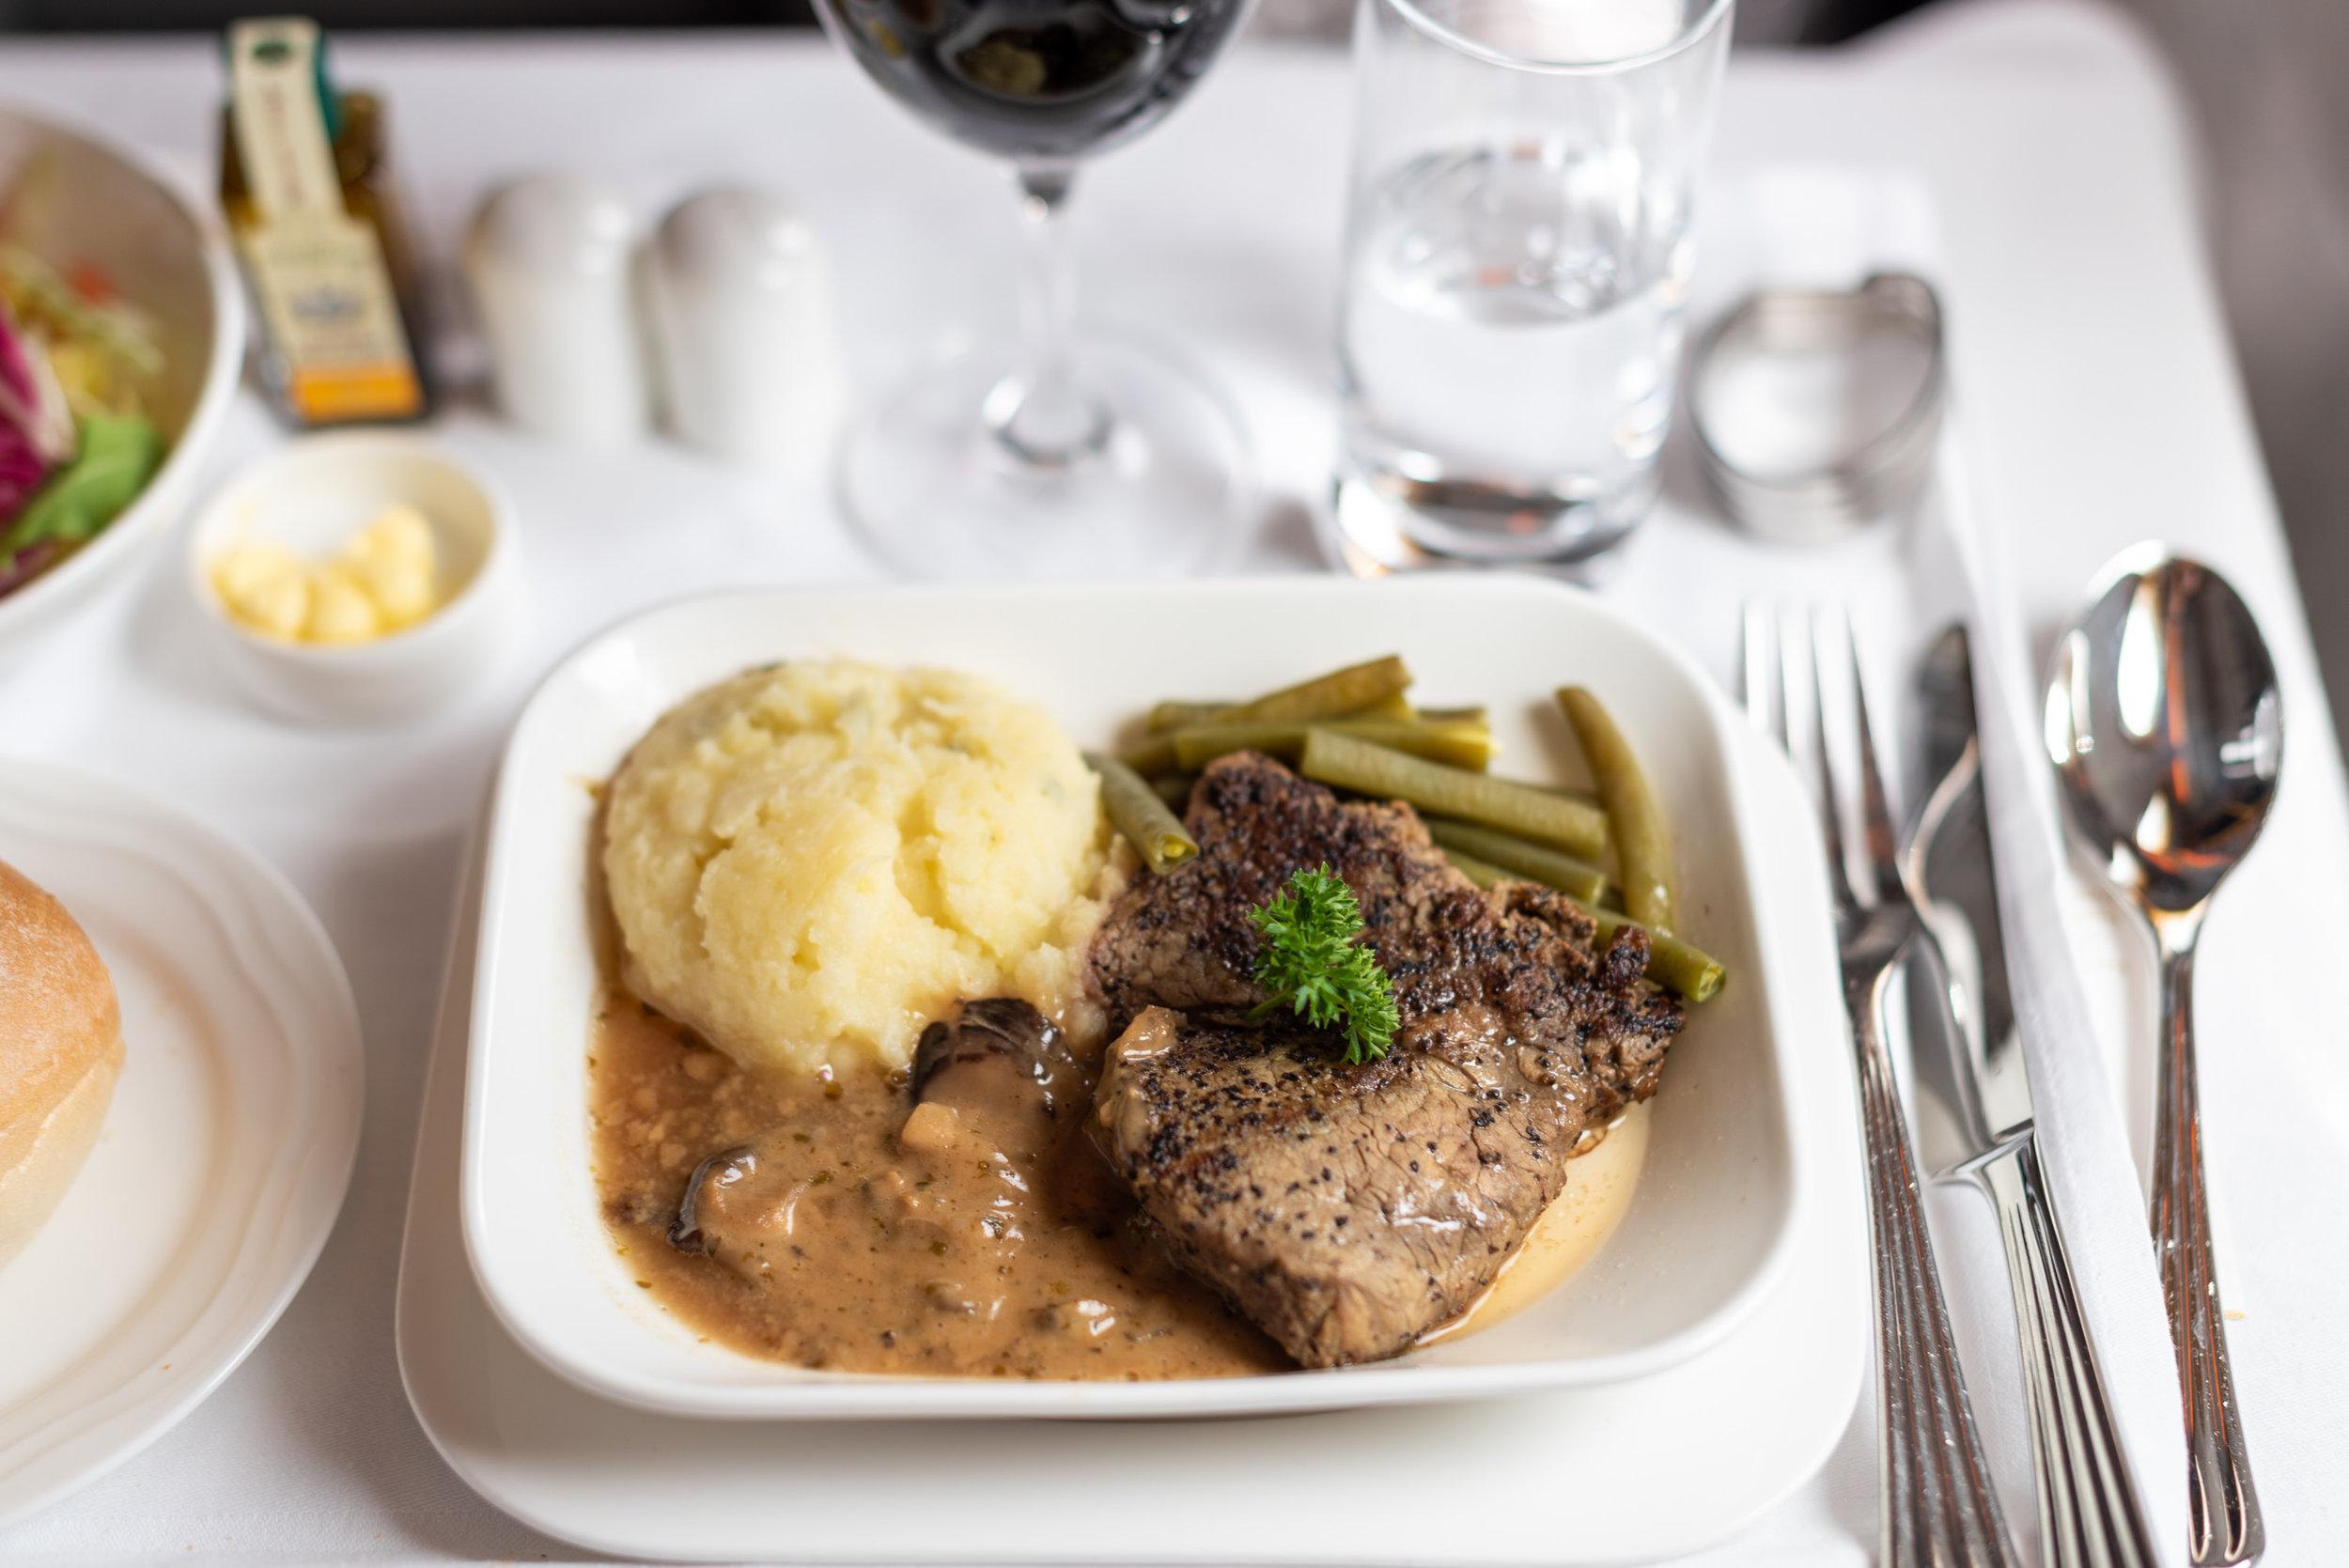 Lunch Service - Seared Beef Tenderloin  Emirates Business Class 777-300ER - SIN to DXB